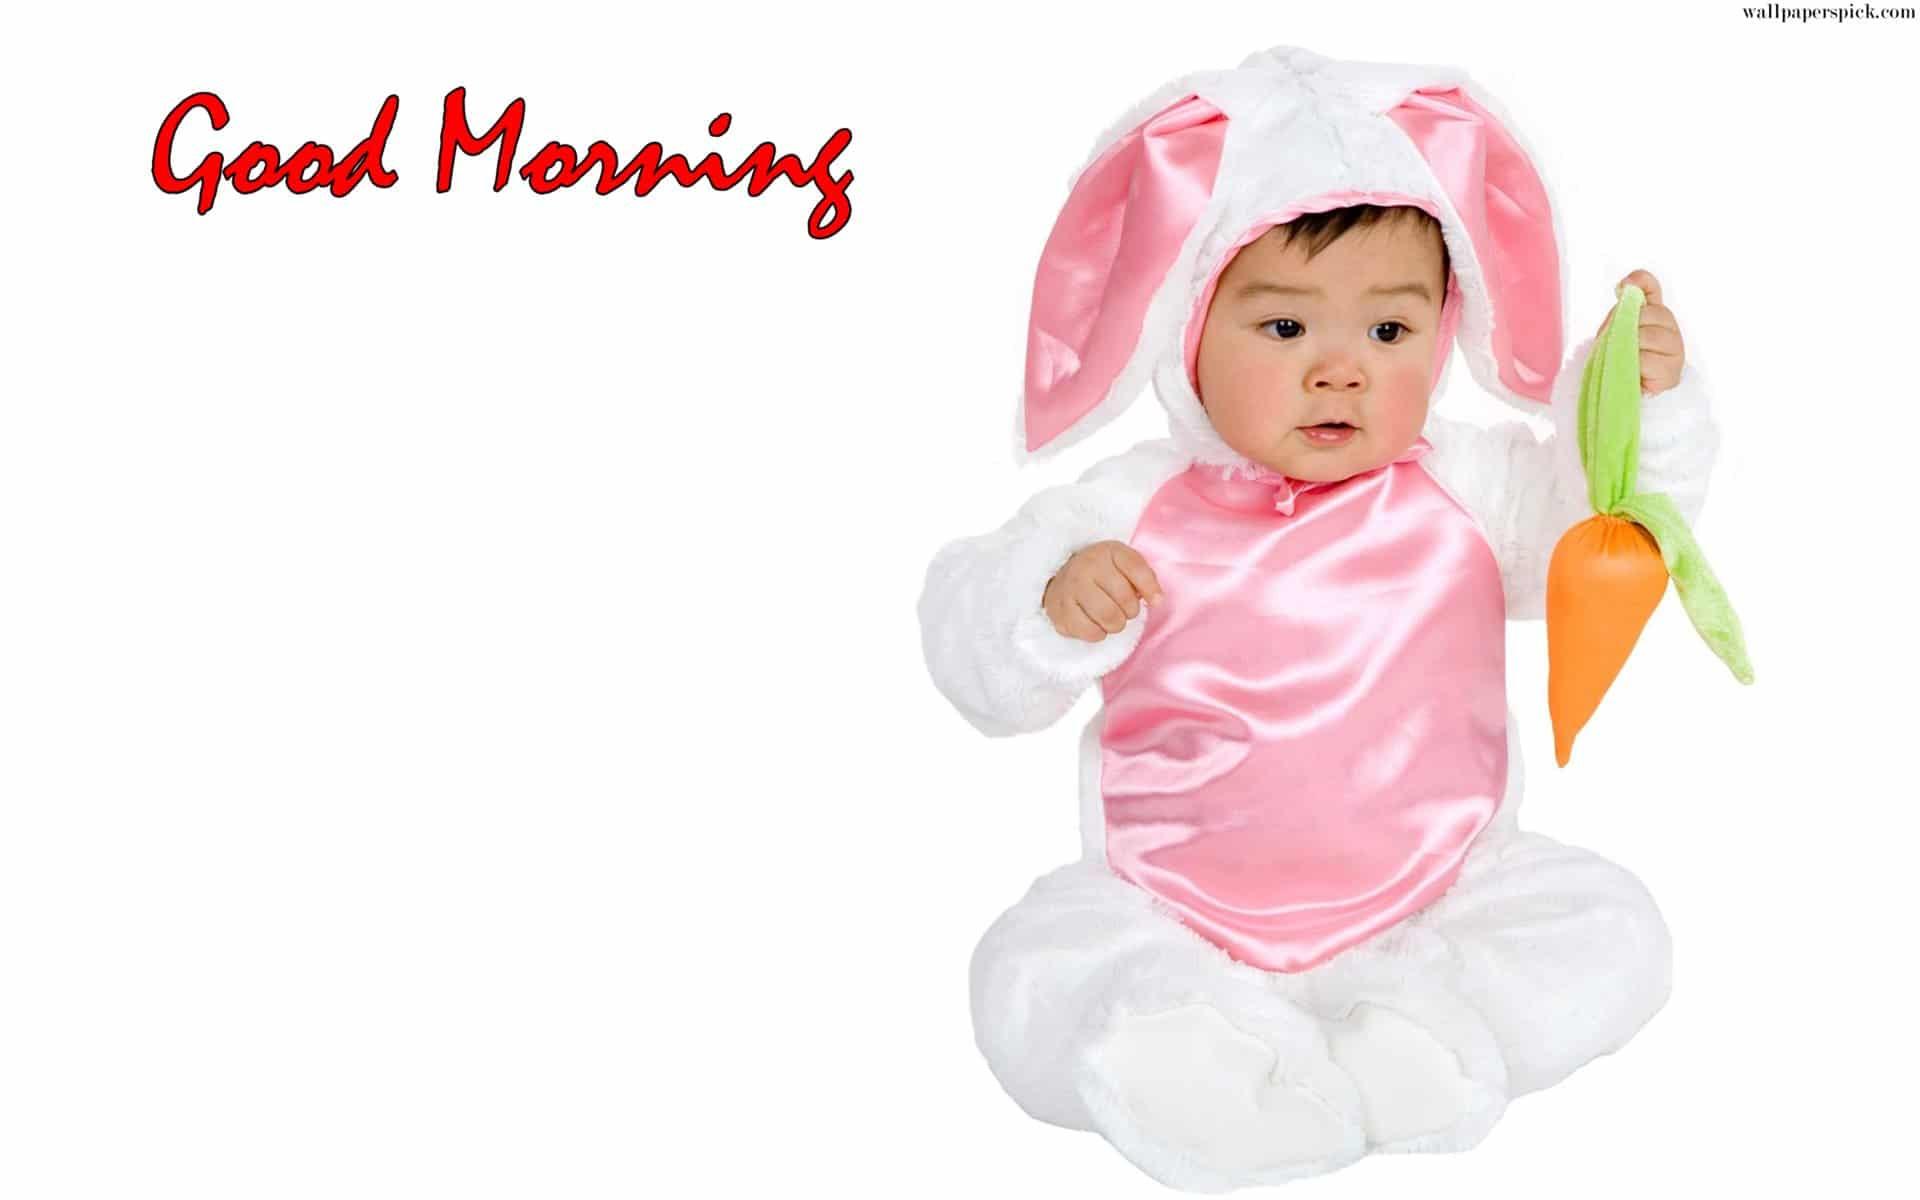 Good Morning Sweet Baby Hd Photos Wallpaperspickcom